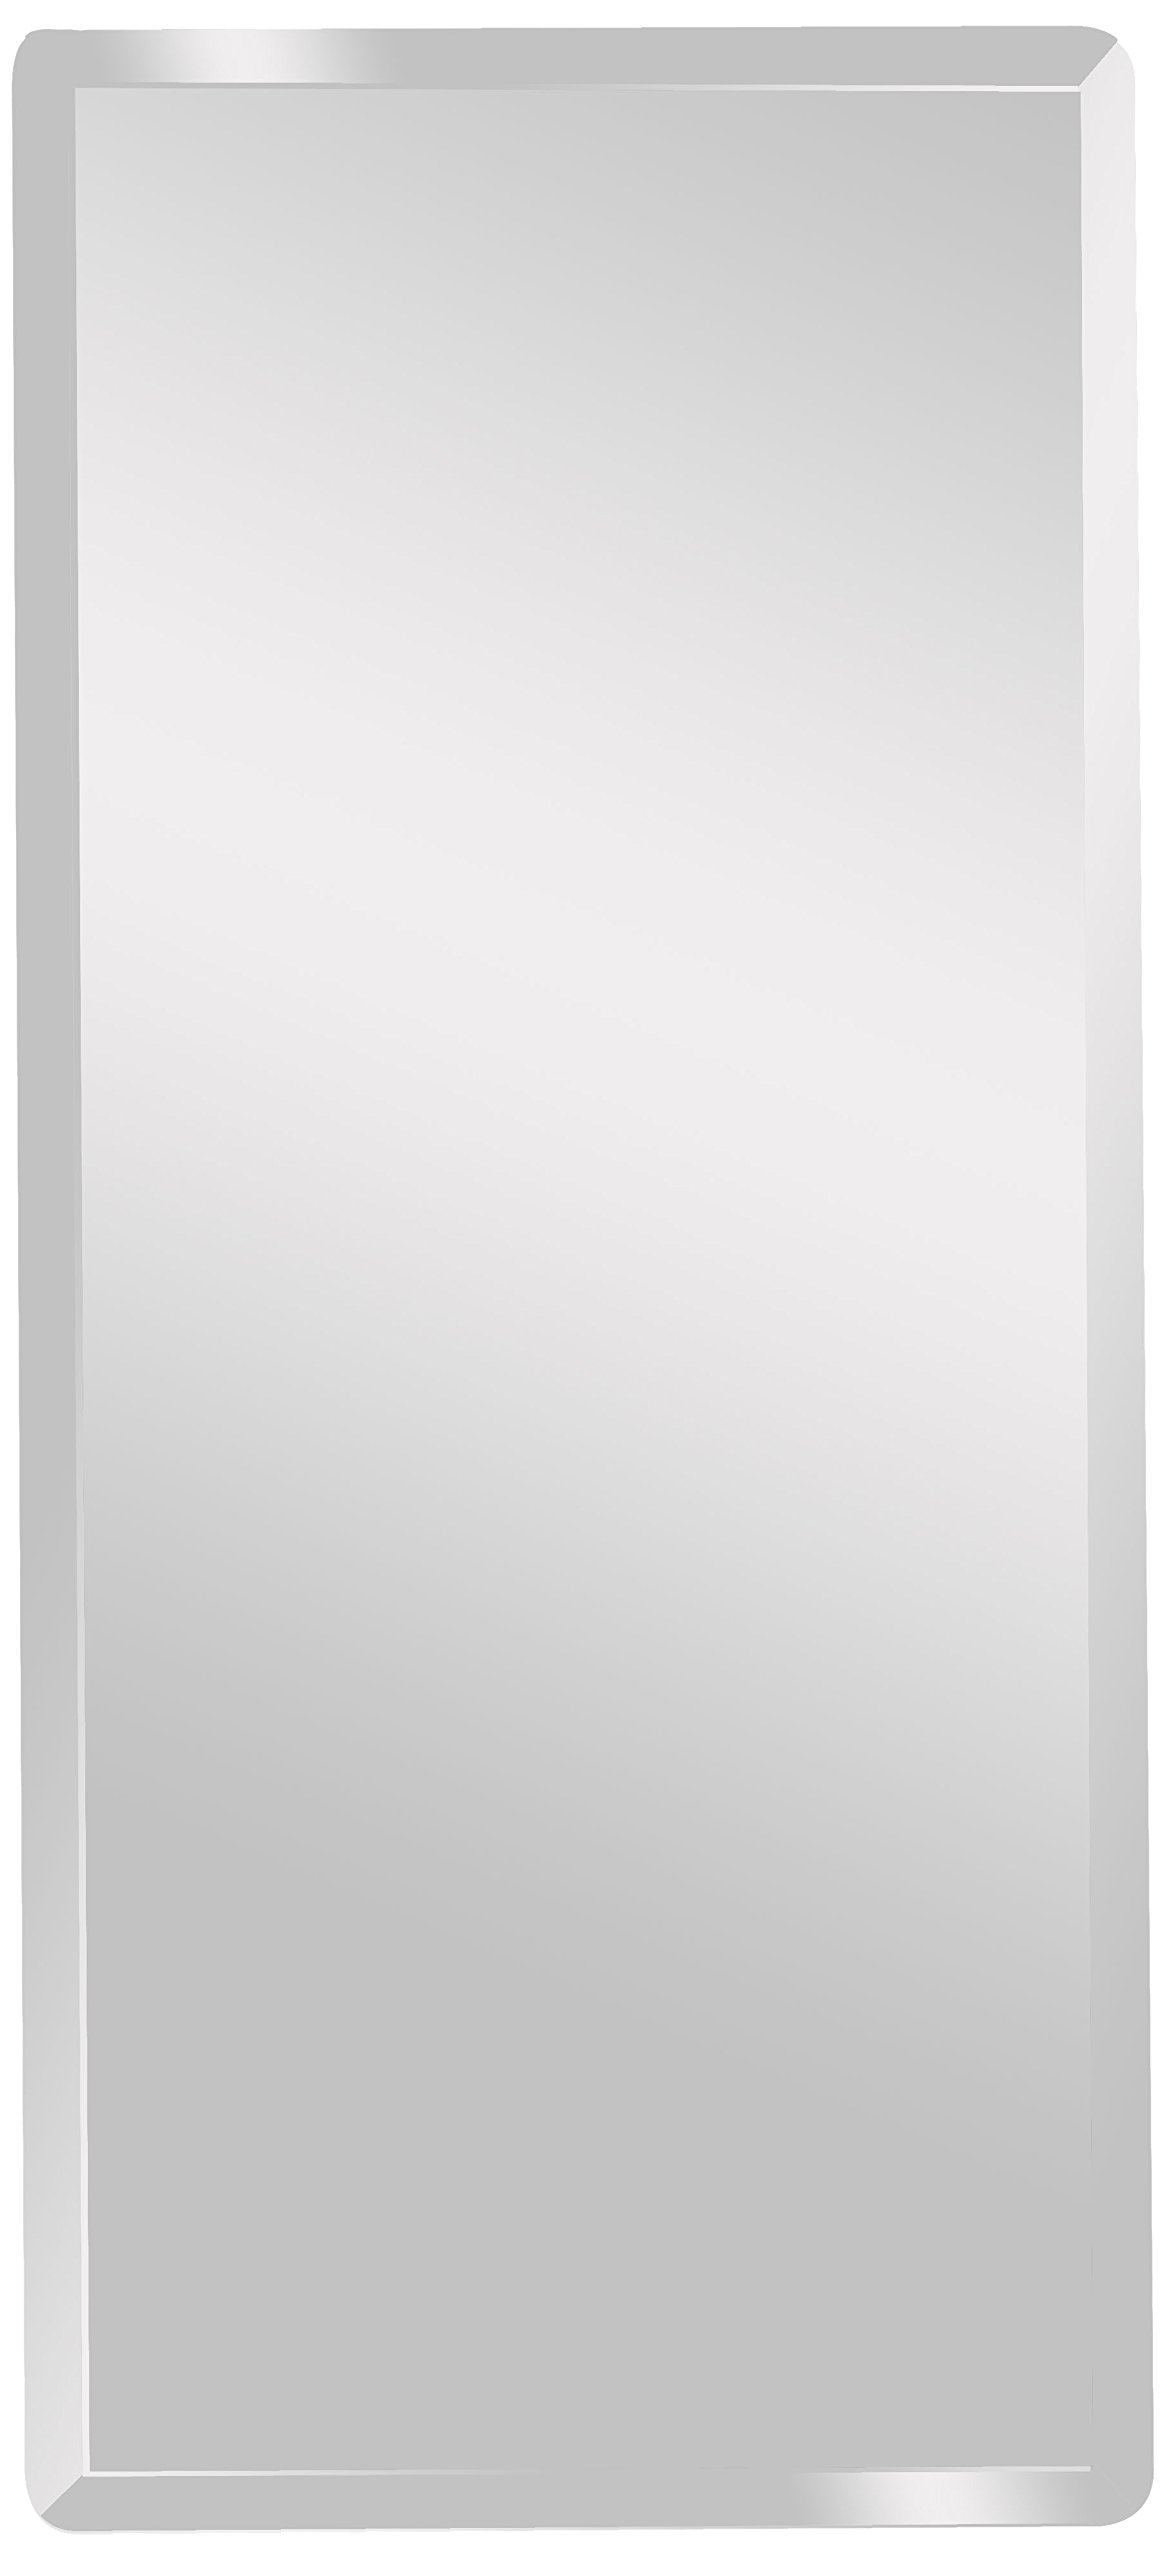 Spancraft Glass 214-2030 Rectangle Beveled Mirror, 20'' x 30''